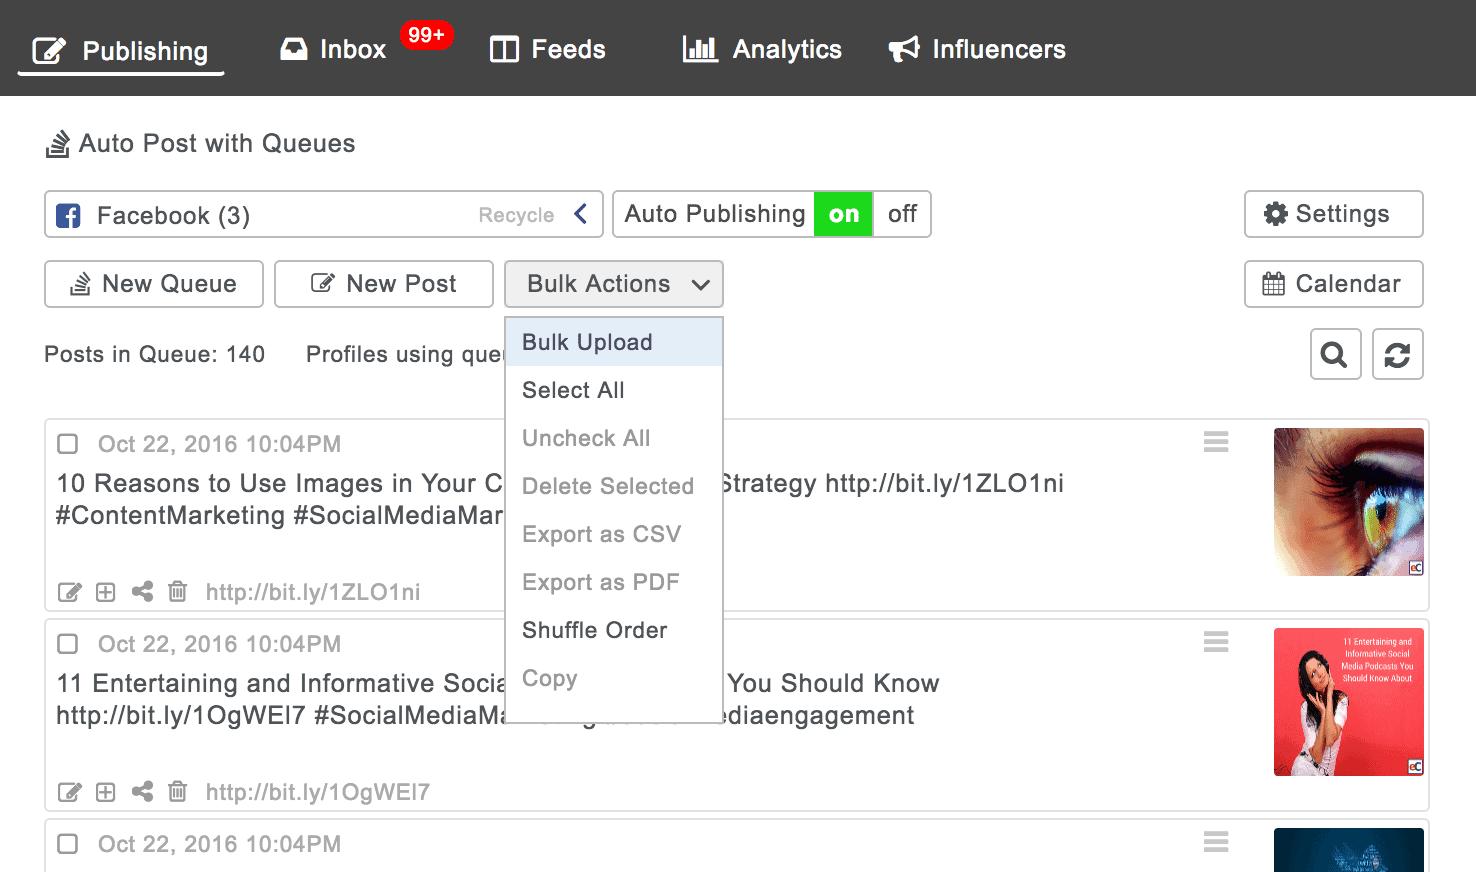 Using Bulk Actions to bulk upload posts